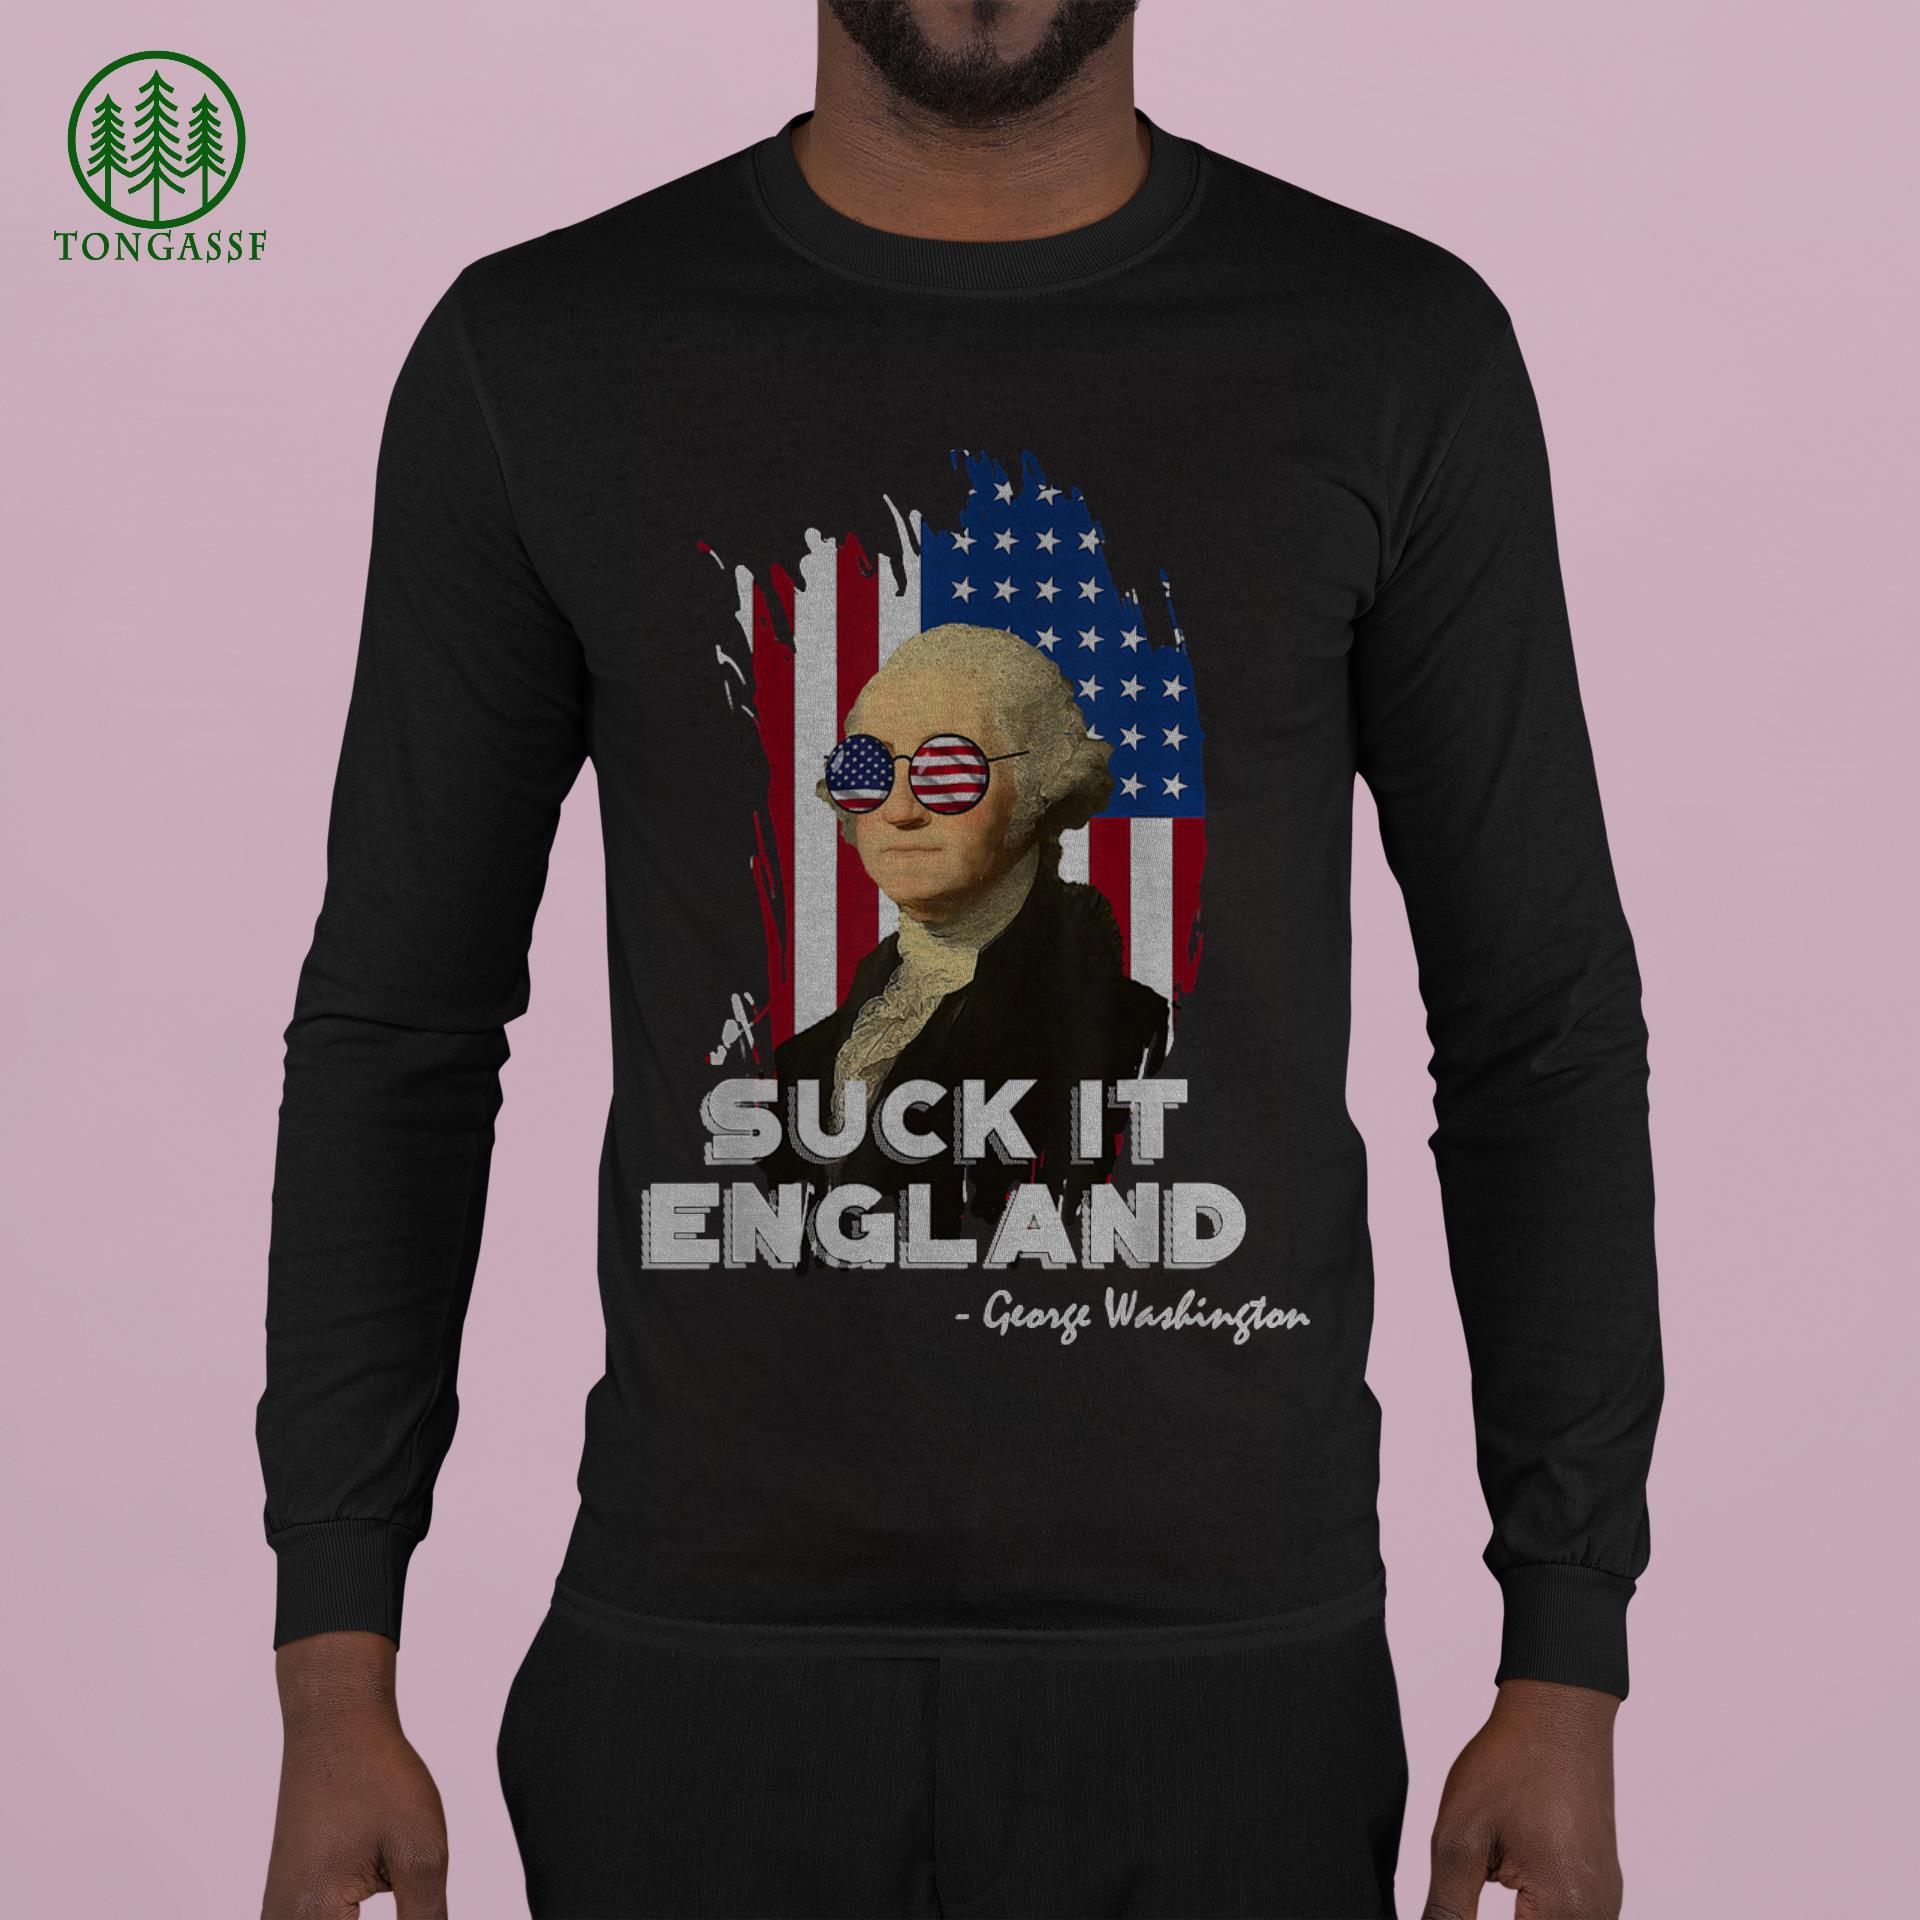 Suck it England George Washington 4th of July Funny Sarcasm Shirt